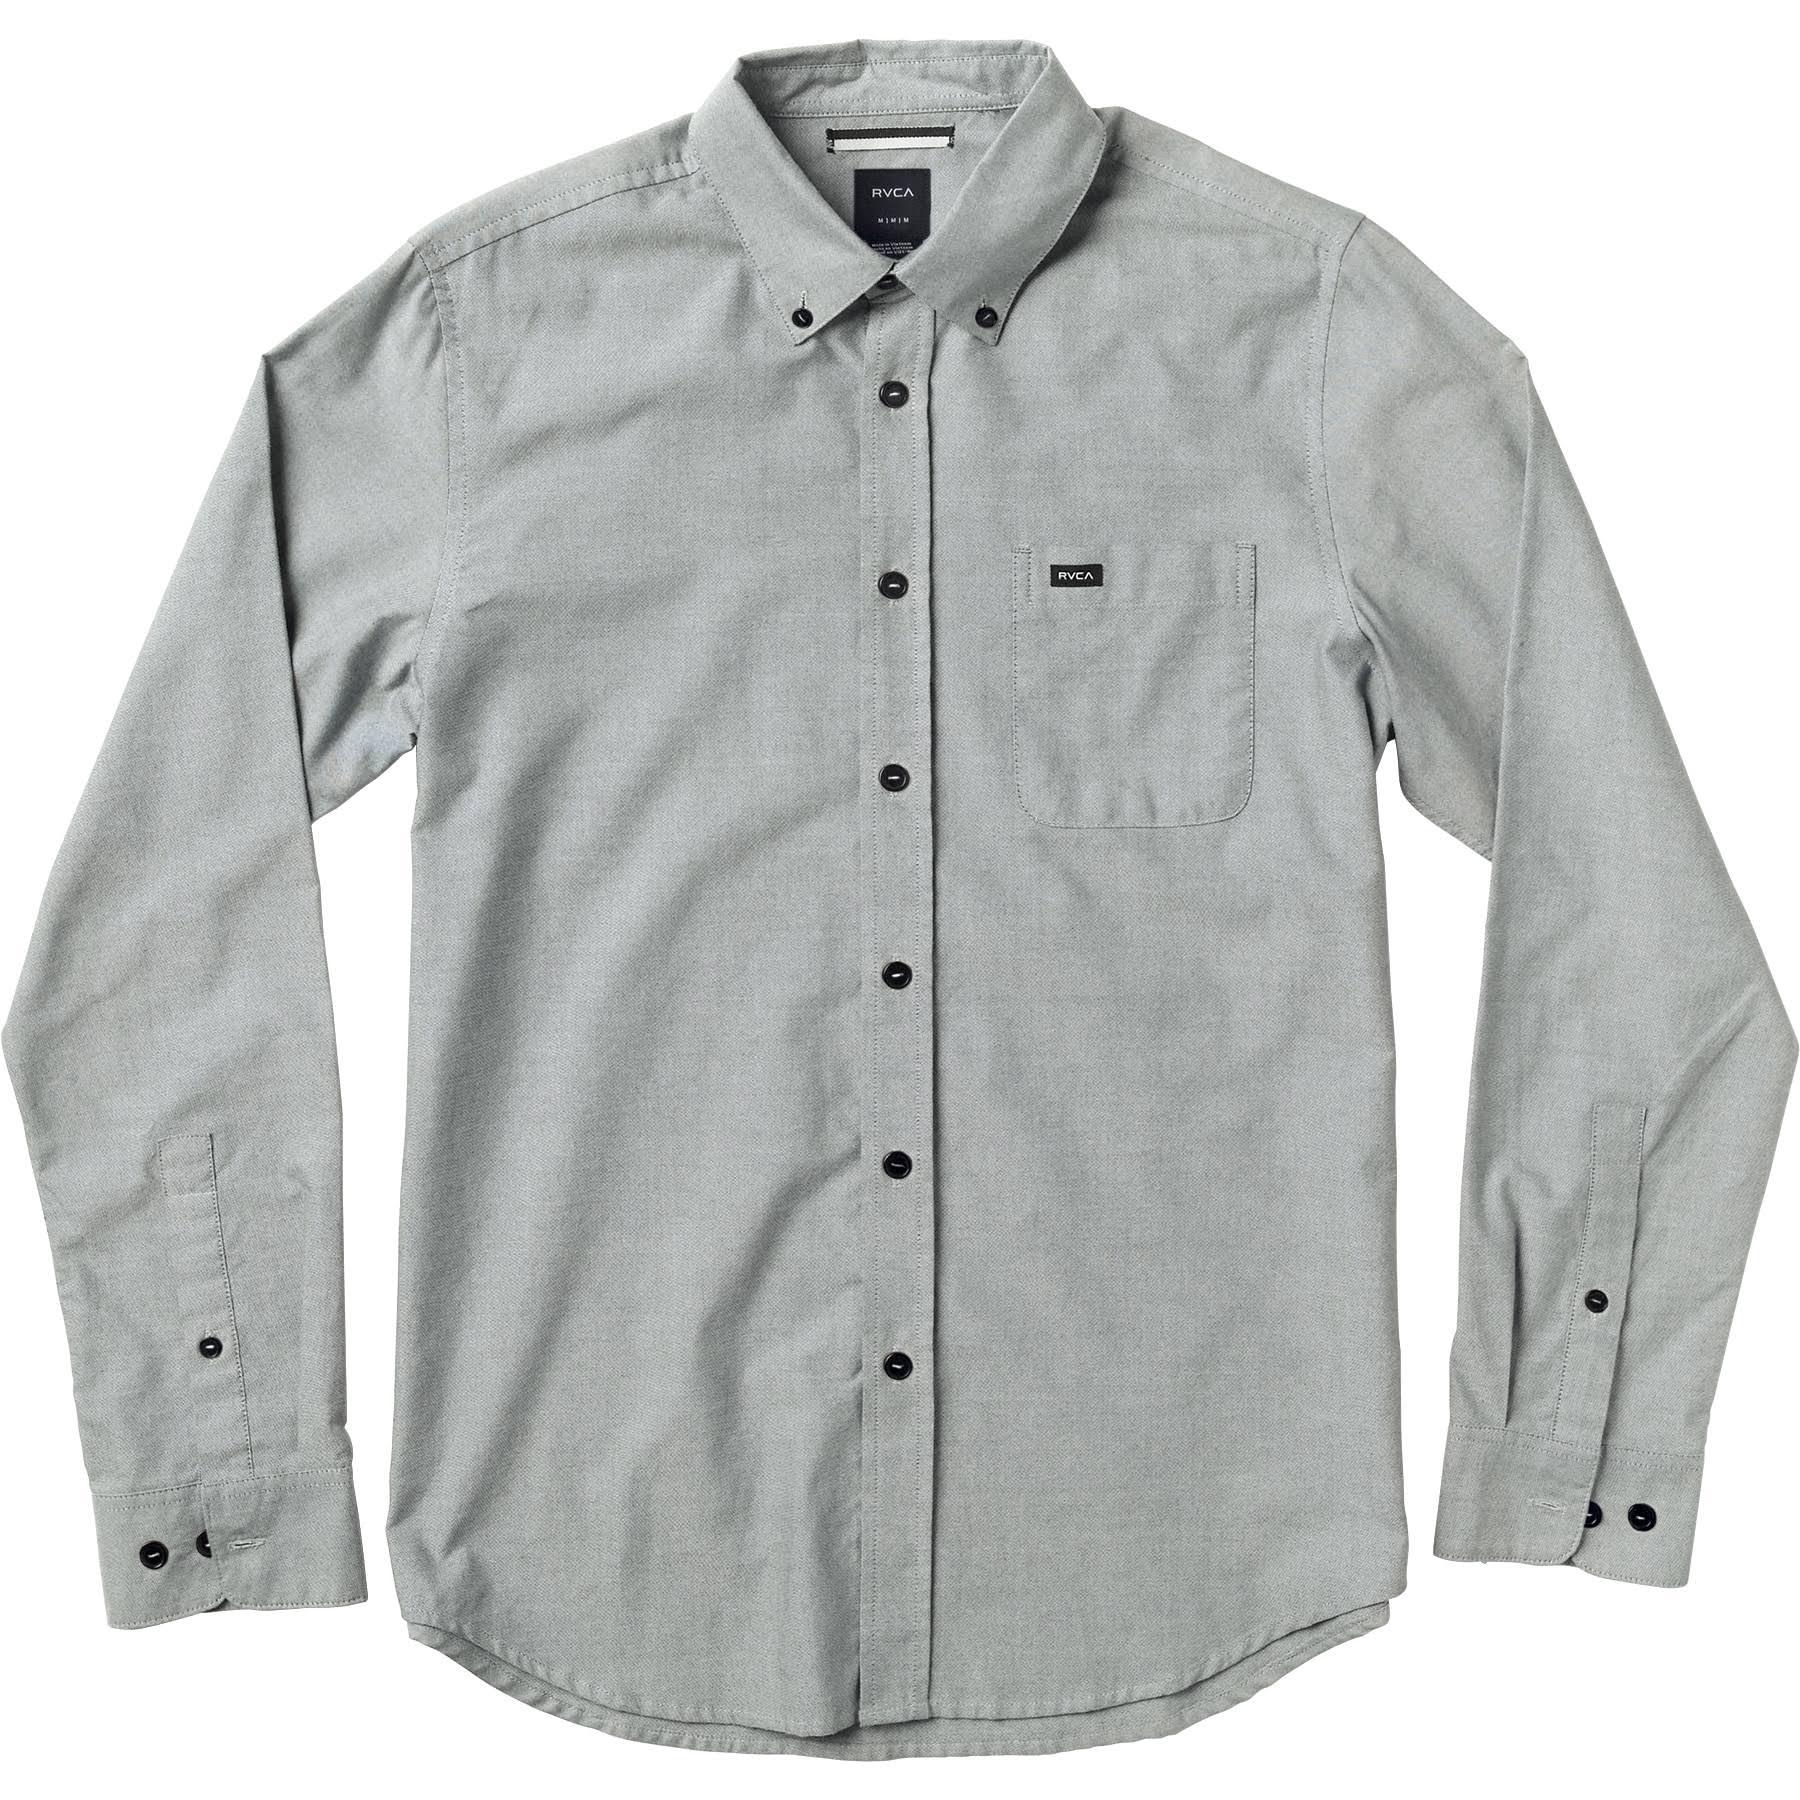 Oxford Rvca Larga De Do Pav Manga That'll Hombre Camisa Pavement CwPOtqnvA